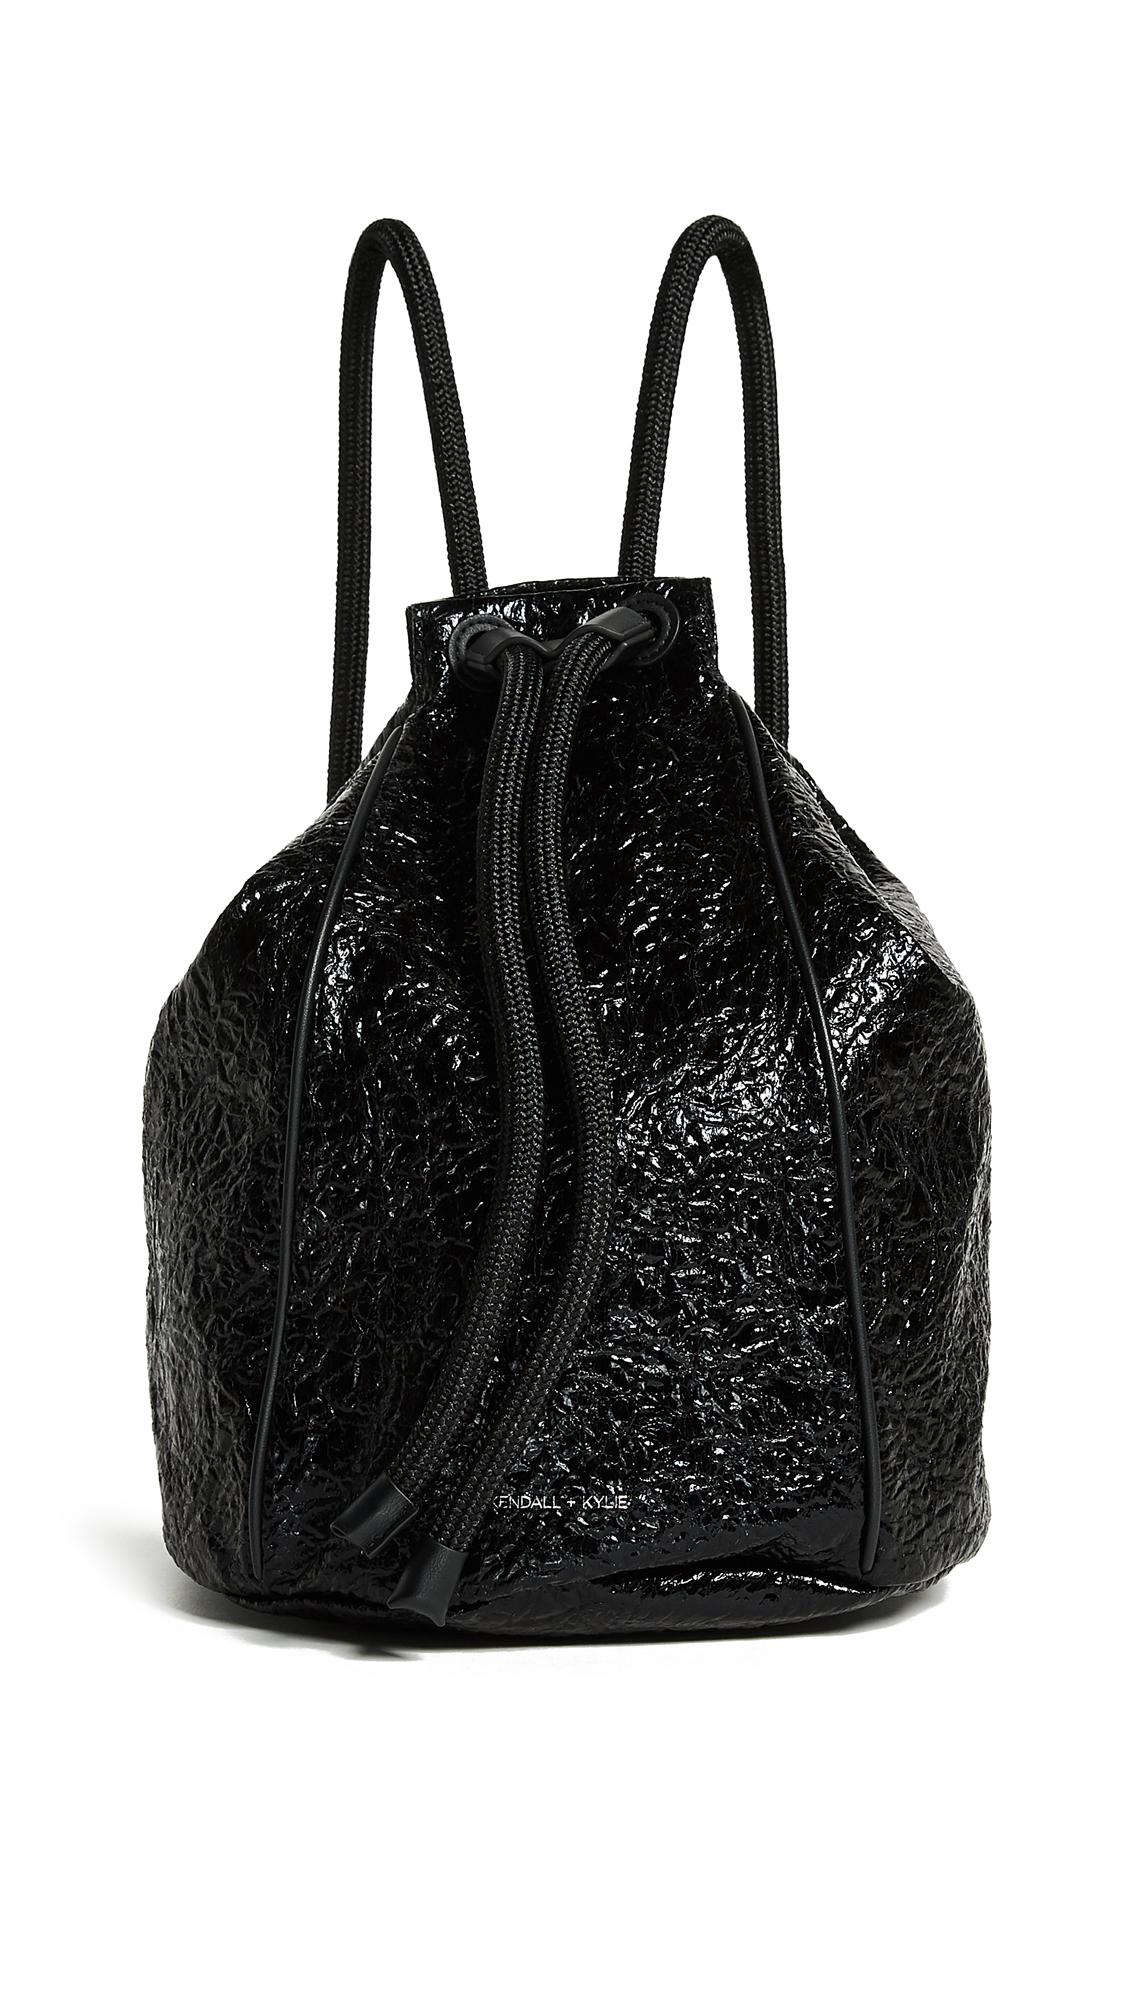 KENDALL + KYLIE Meadow Convertible Backpack - Black